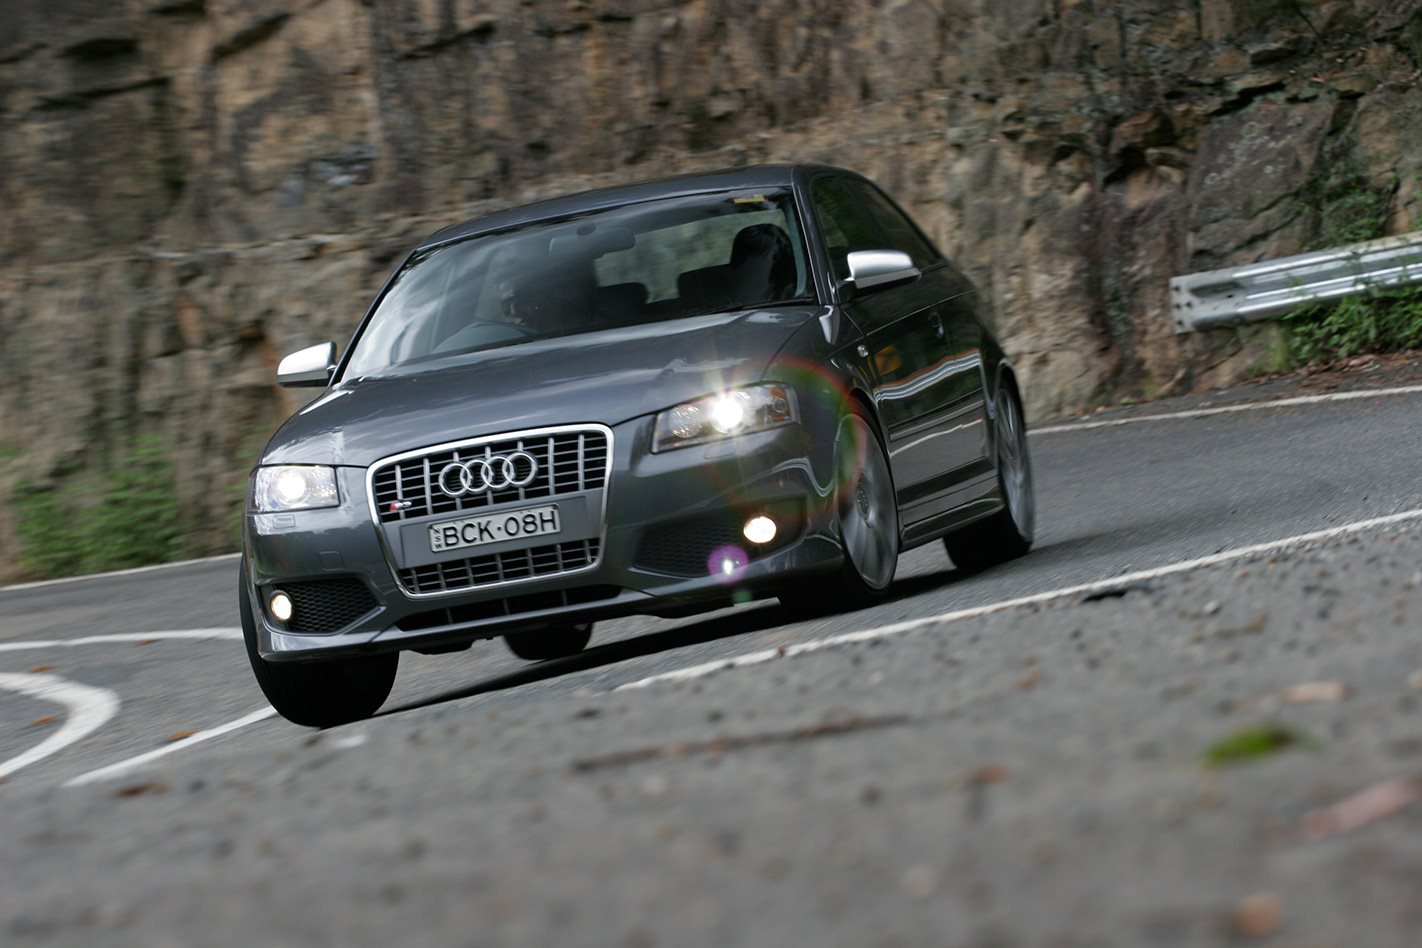 2008 Audi S3 front.jpg